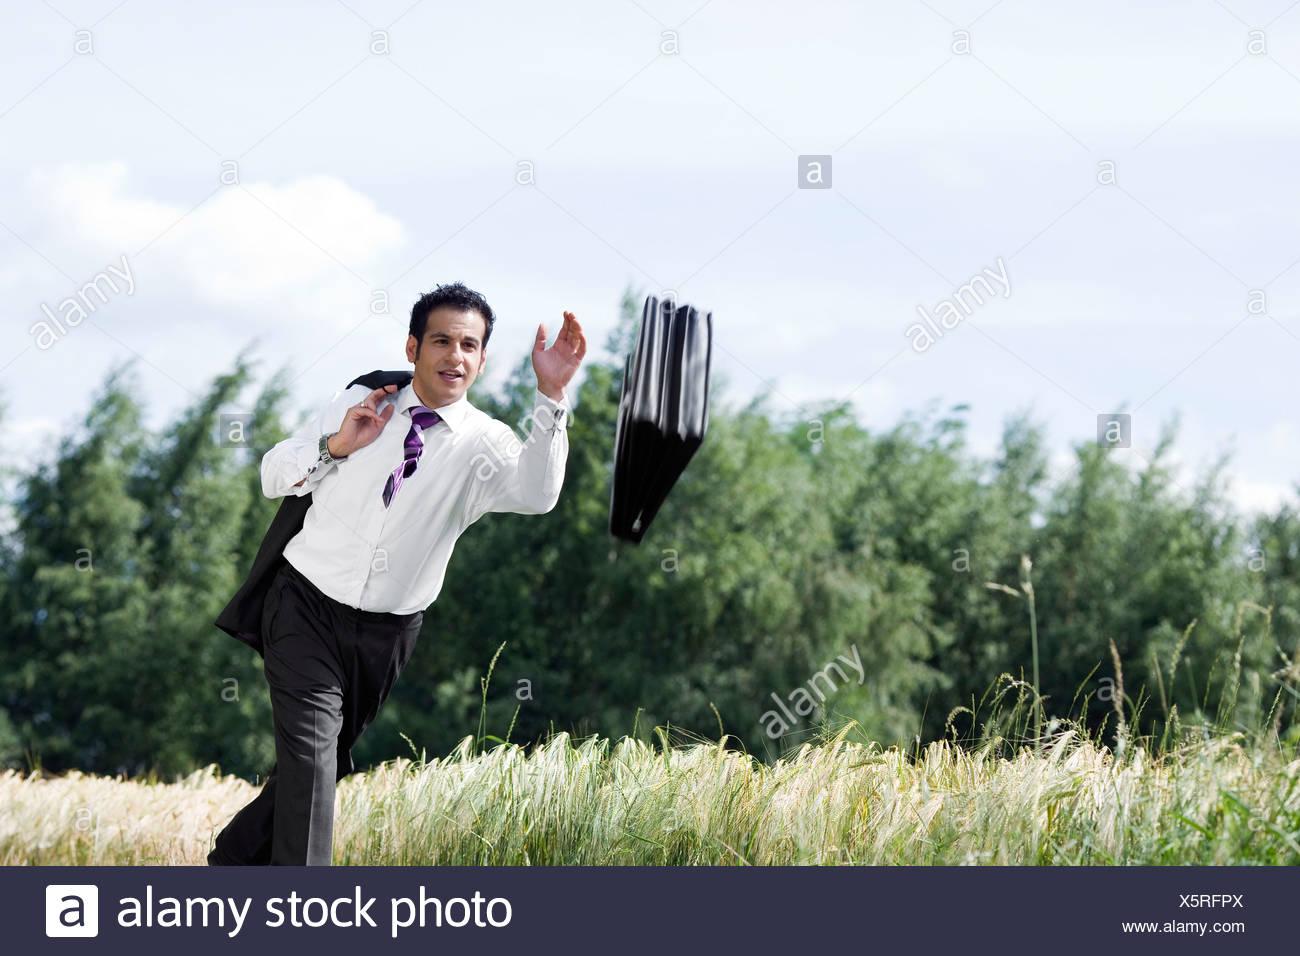 man throwing briefcase - Stock Image